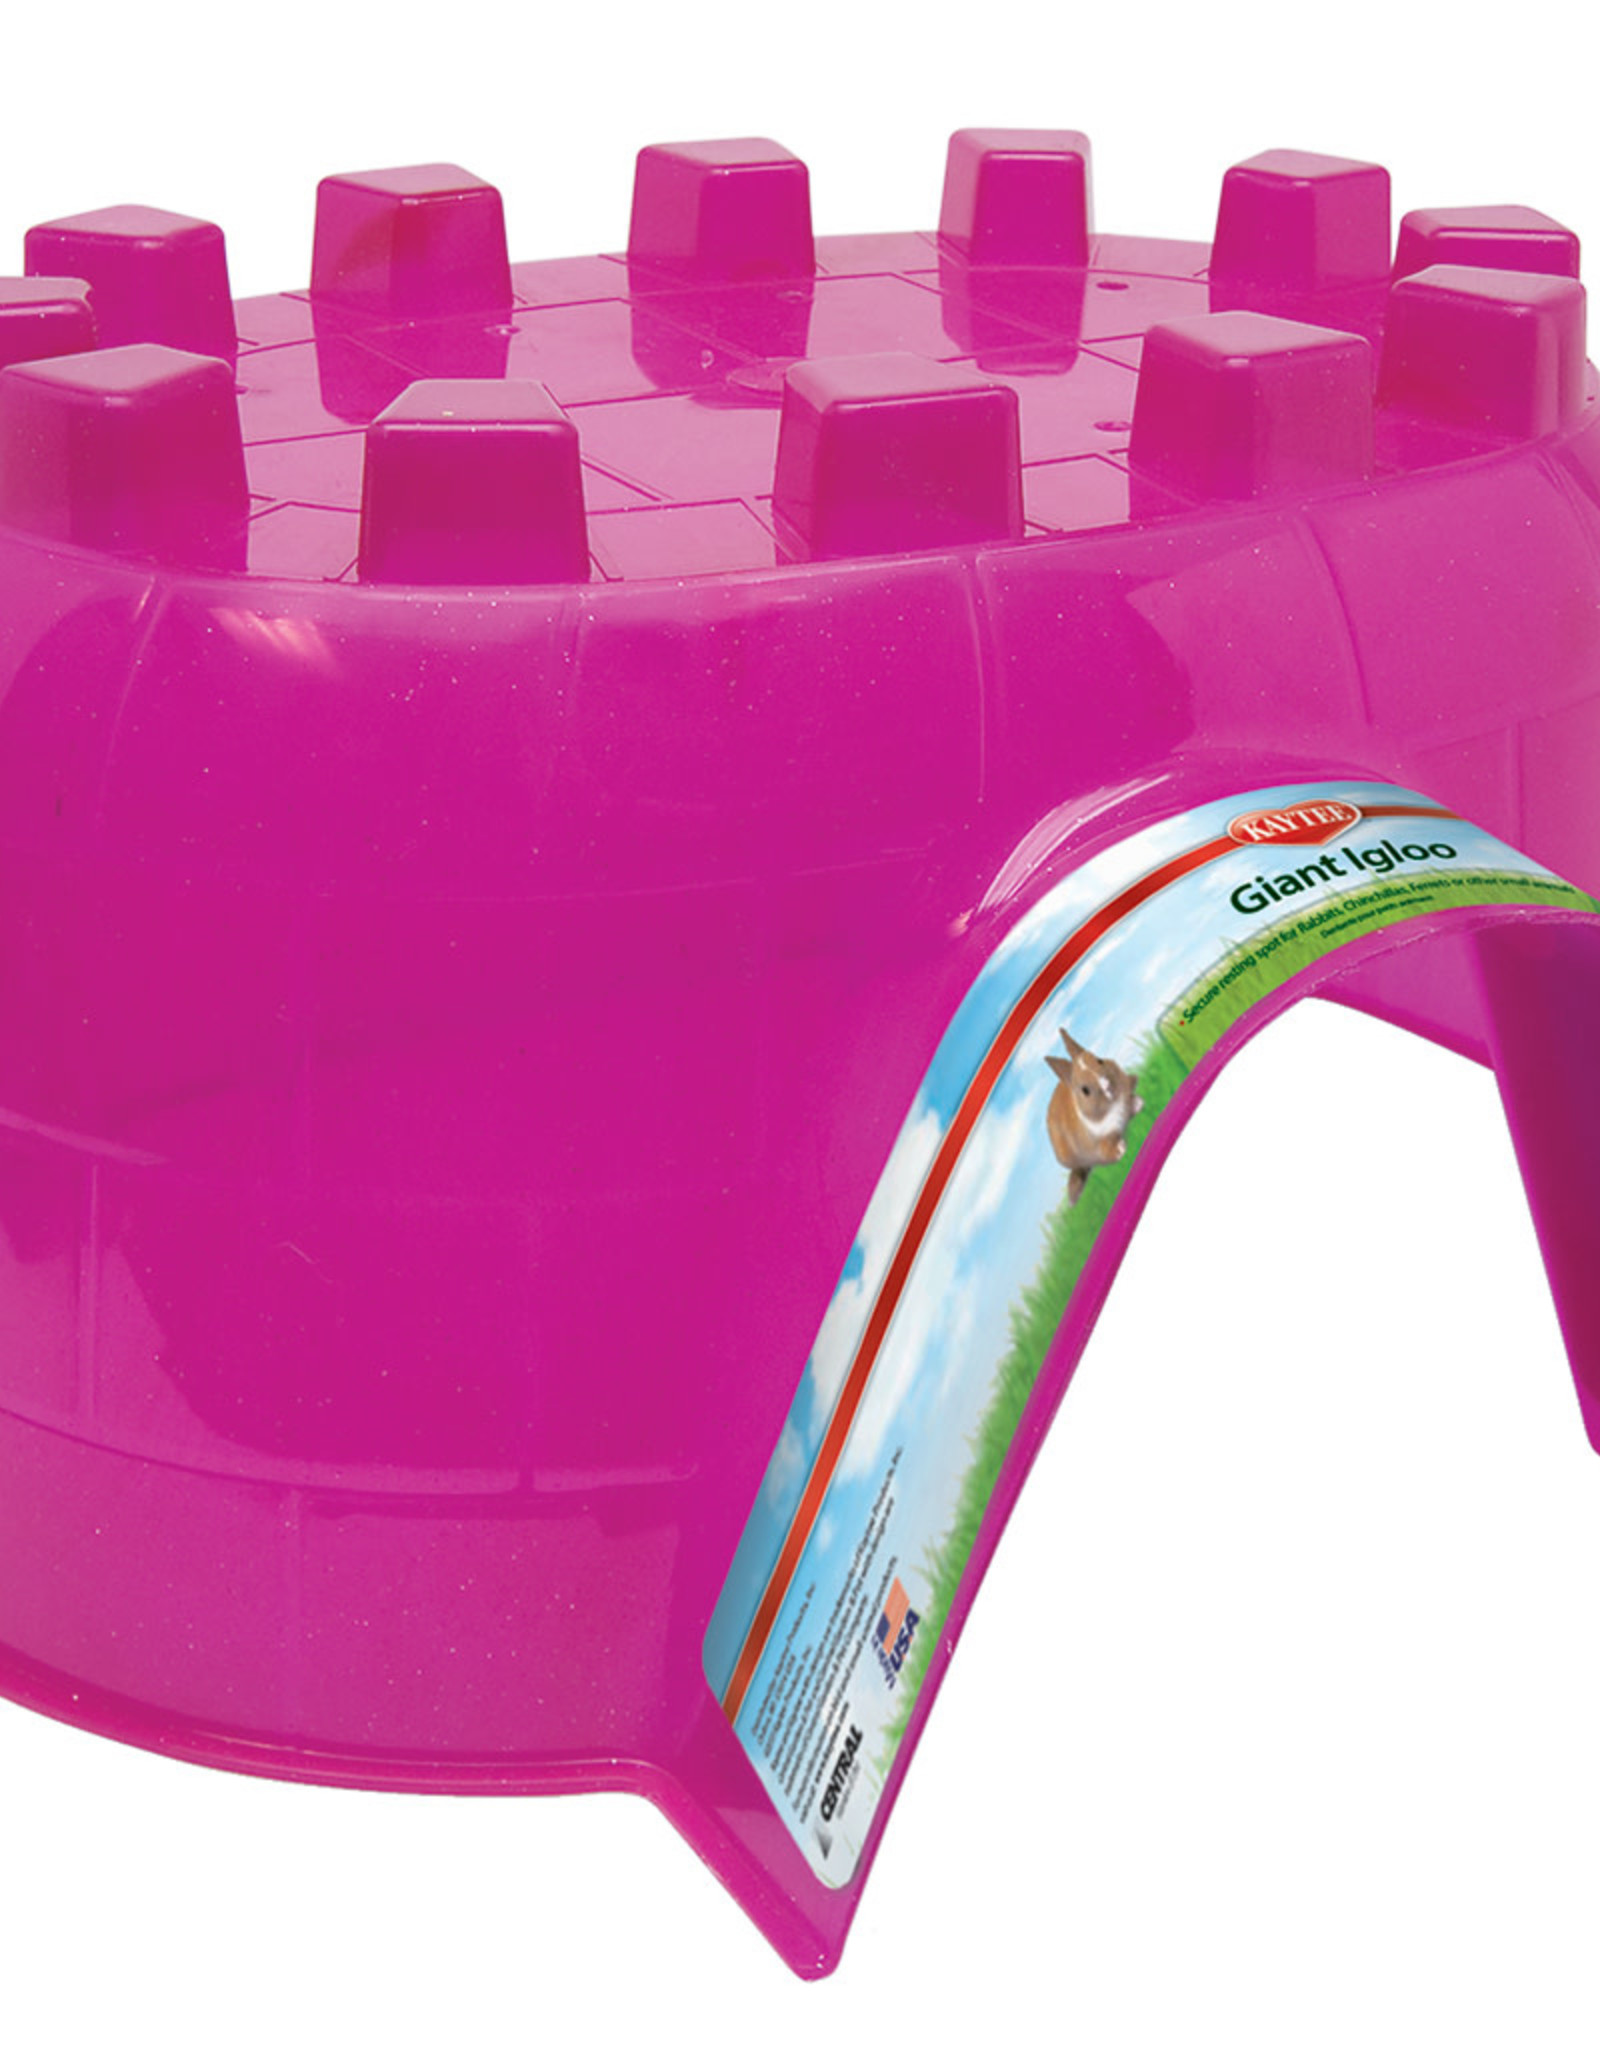 KAYTEE PRODUCTS INC KAYTEE Giant Igloo Assorted Color